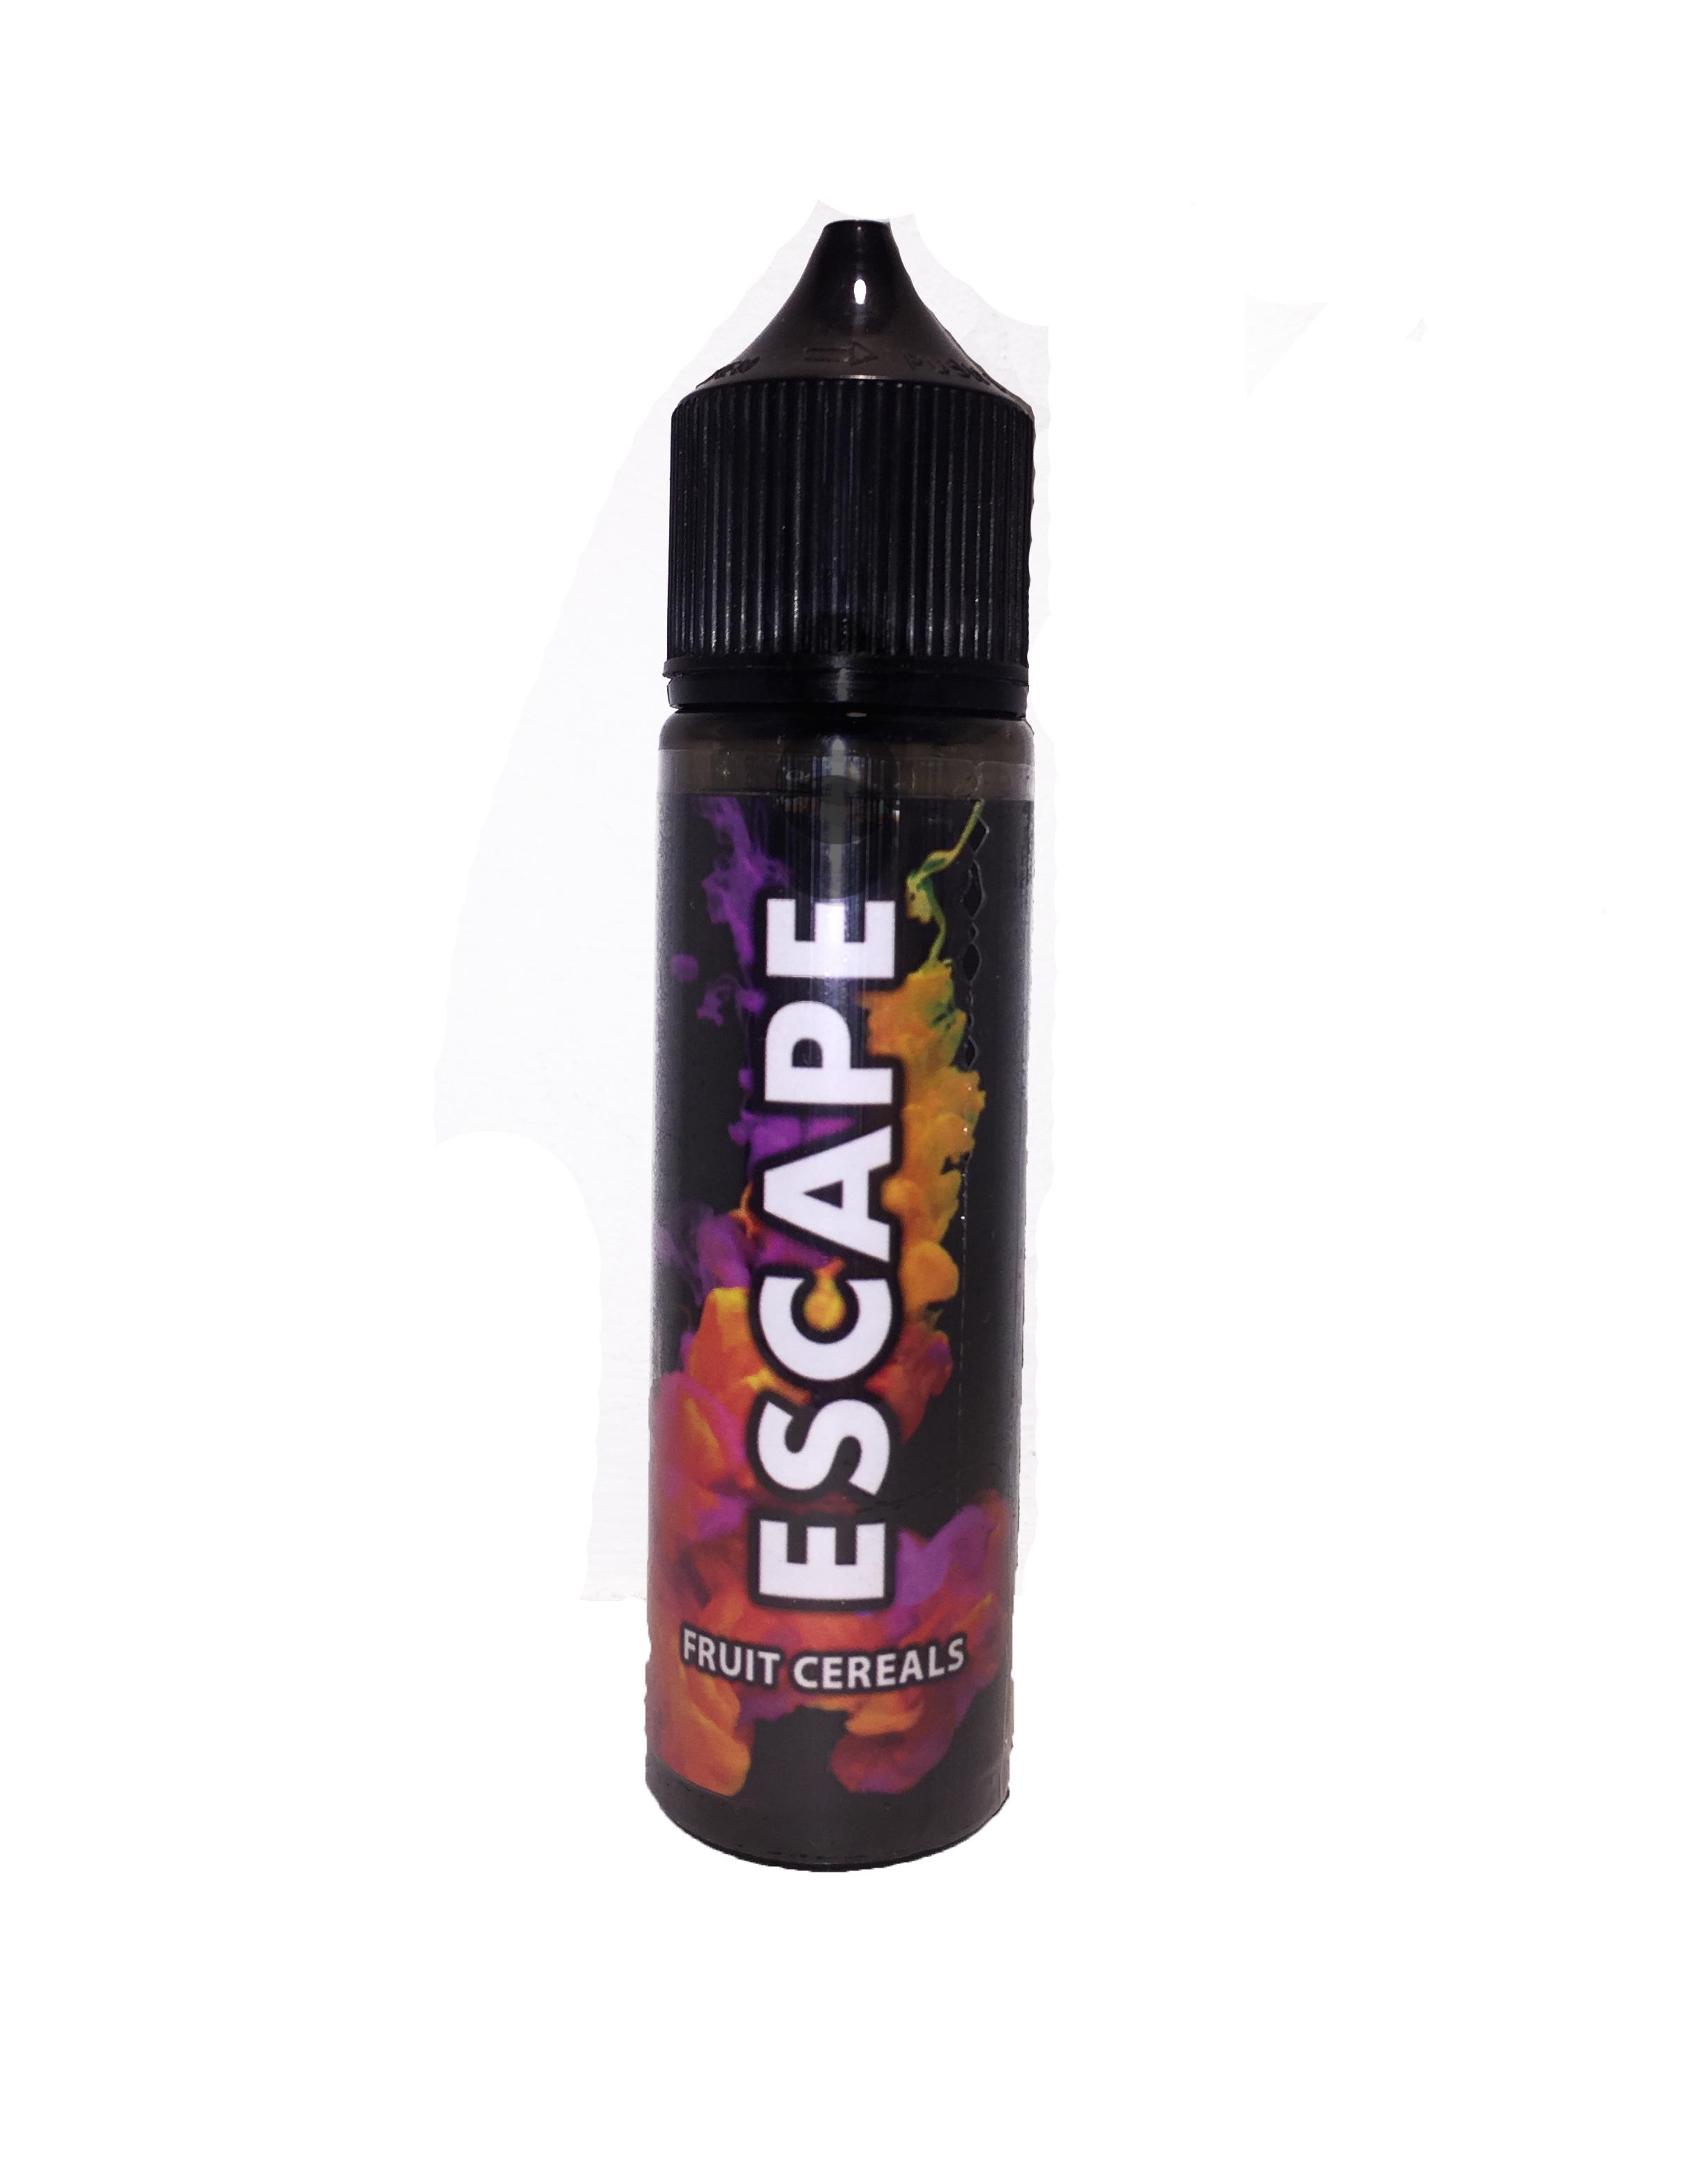 Fruit Cereals by Escape E-Liquid - 60 ml